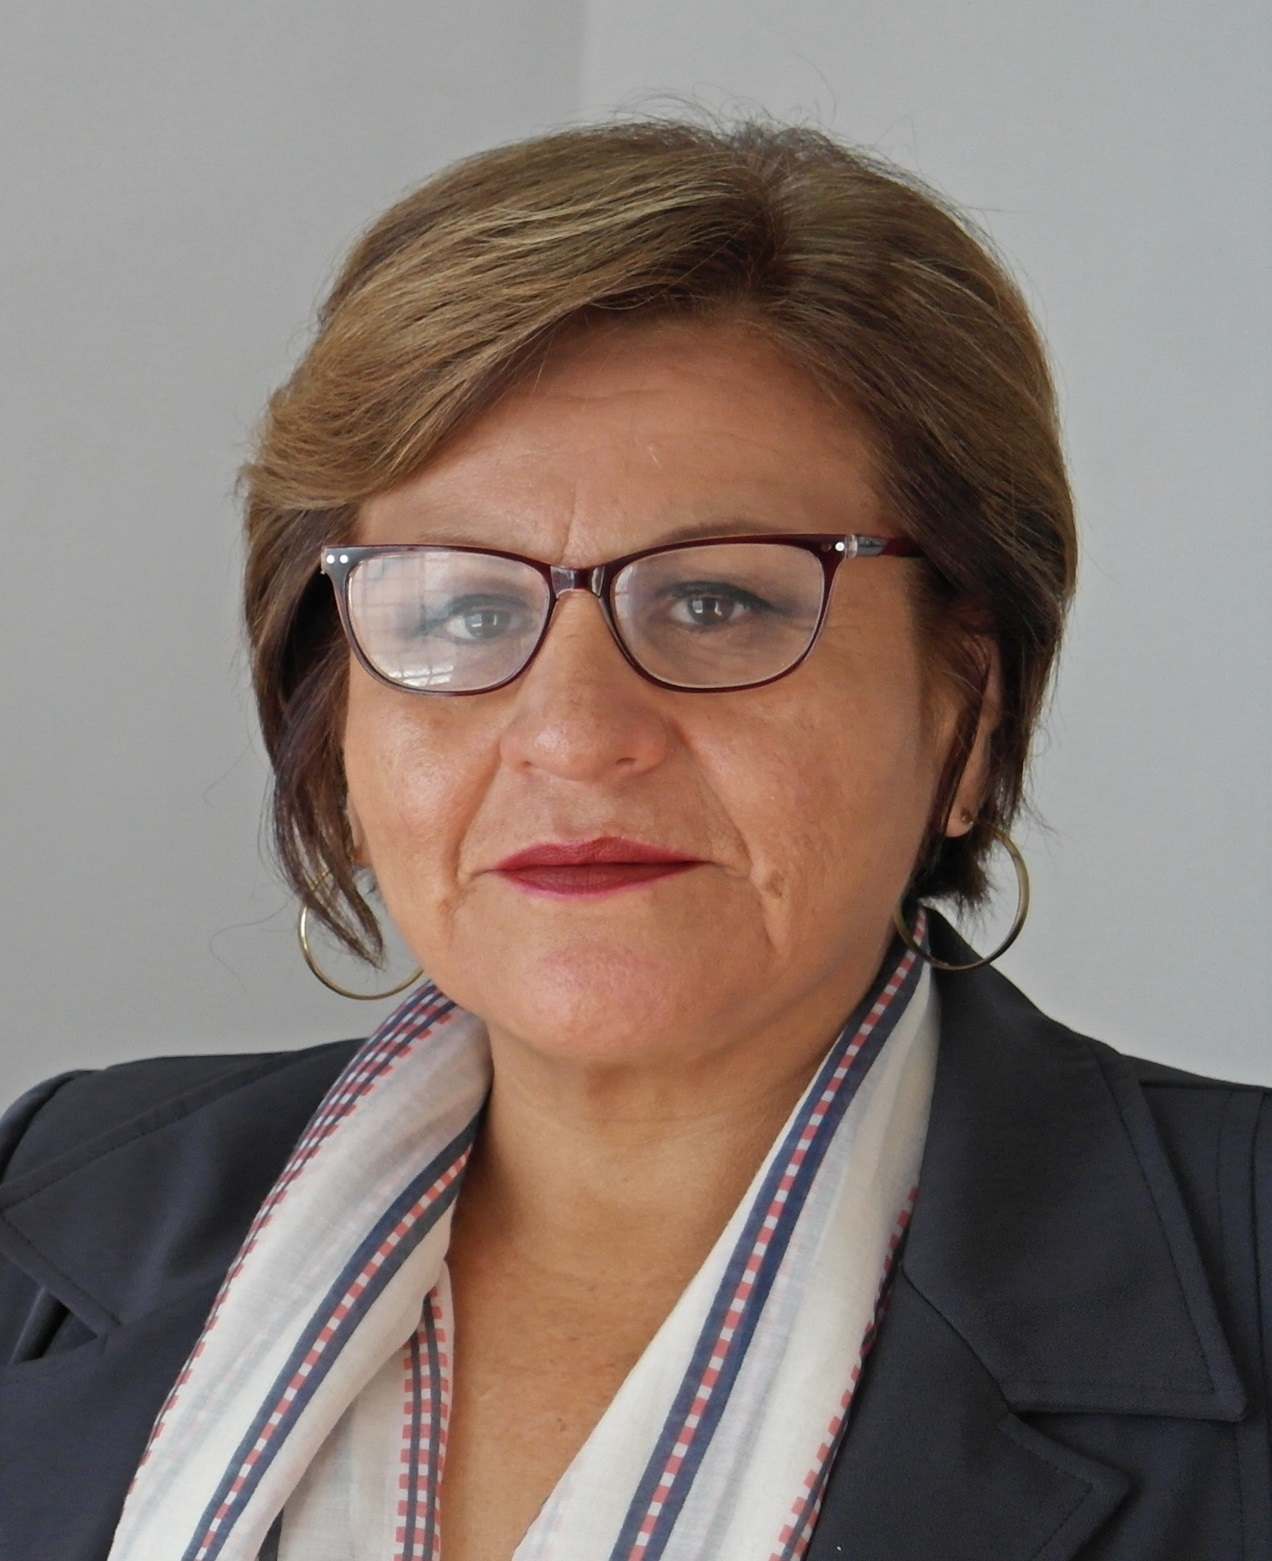 Jacqueline Fabian